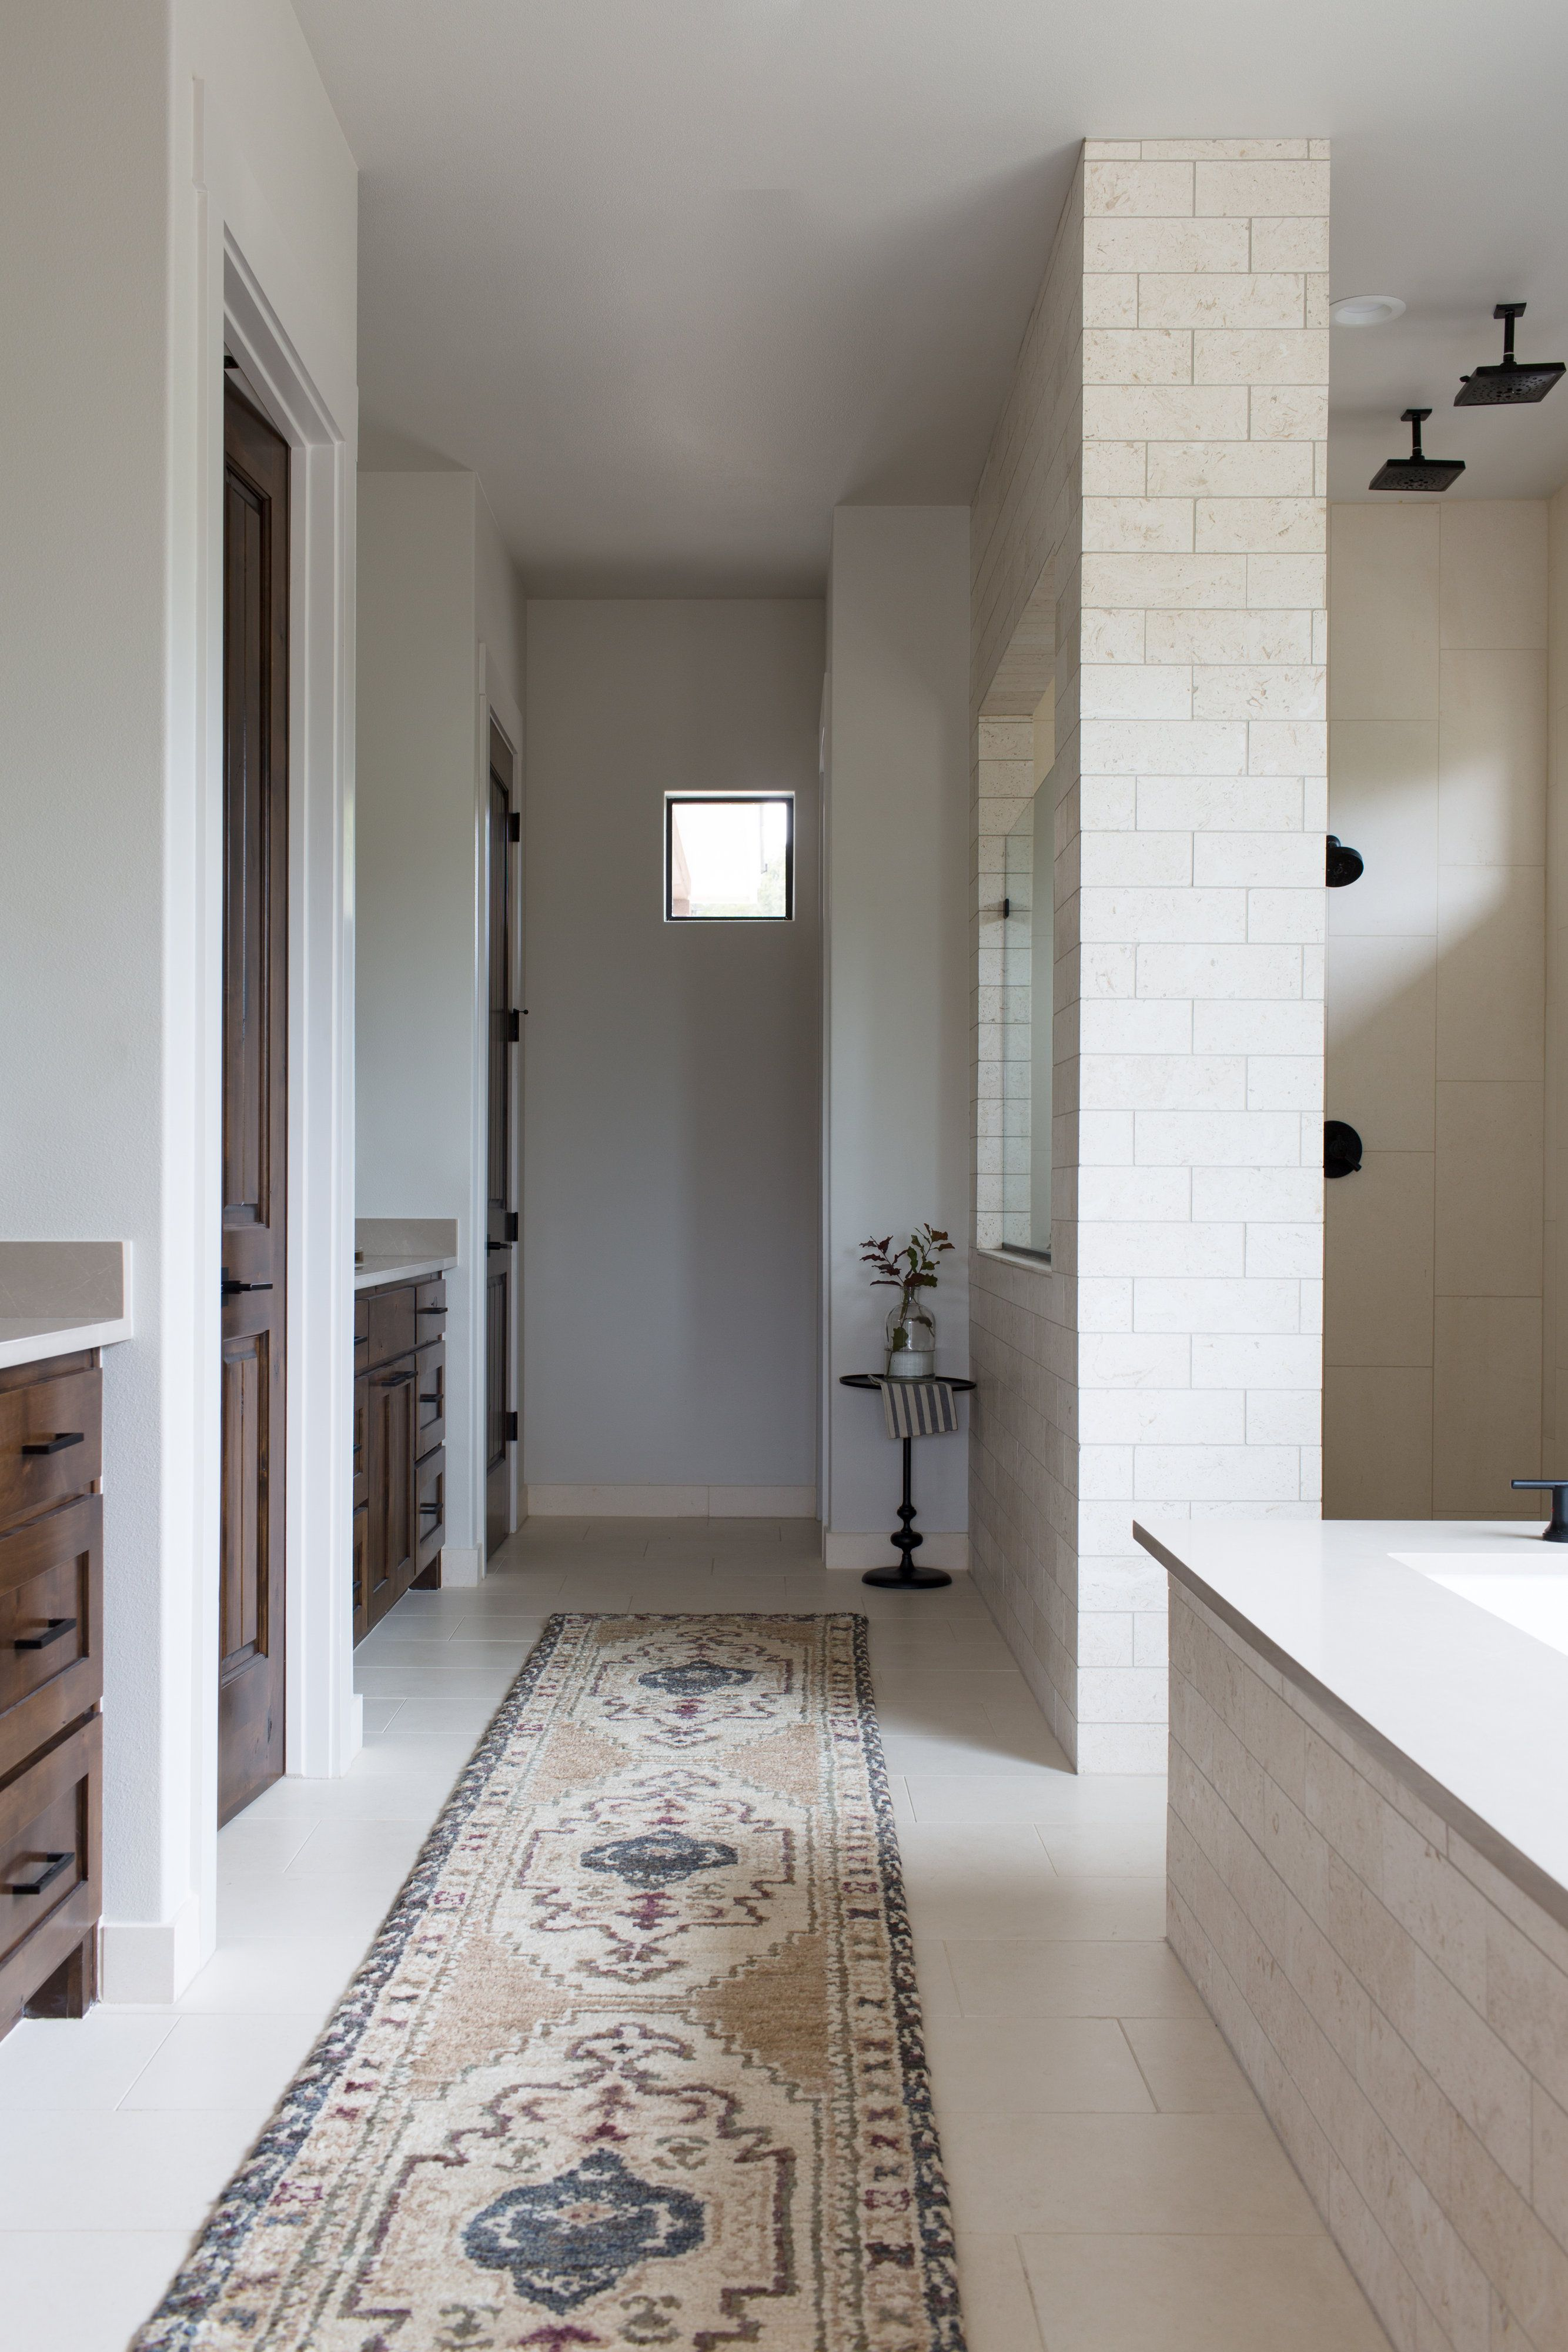 Master Bath With Limestone Tile Bathroom Design Beautiful Bathroom Designs Bathroom Remodel Designs [ 4000 x 2667 Pixel ]